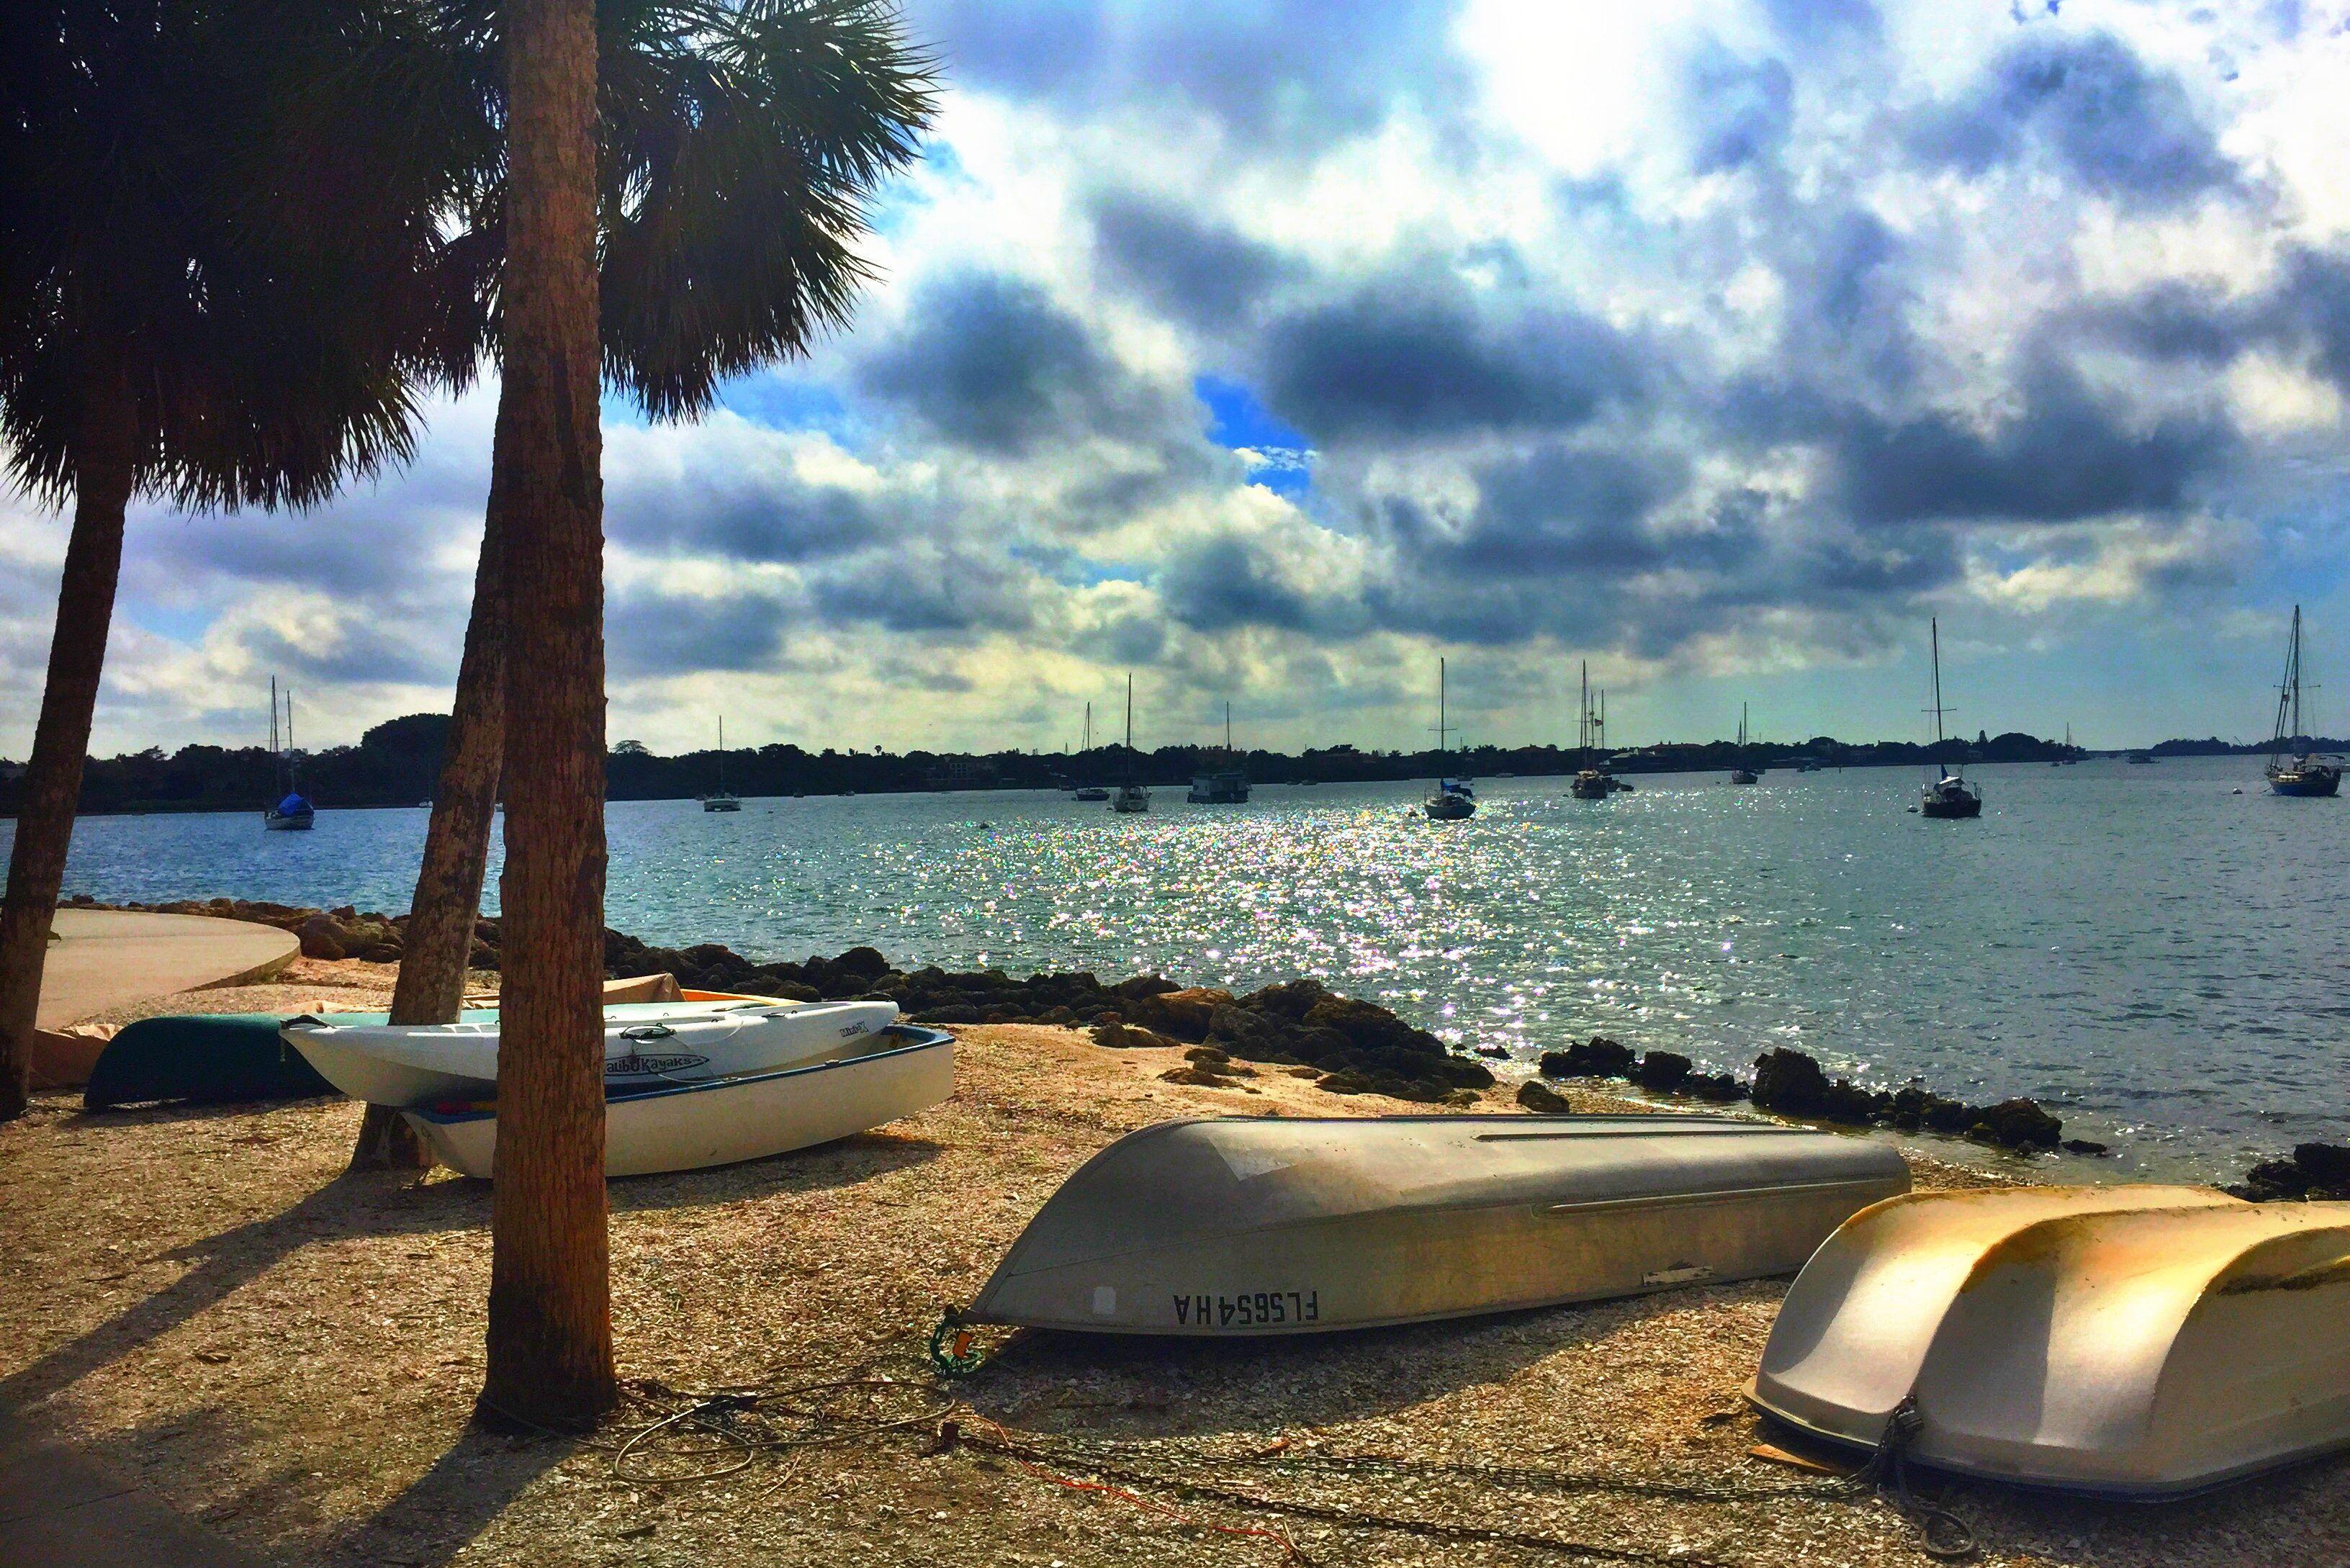 7 Things I M Loving In Sarasota Florida Right Now Maps Merlot Best Island Vacation Sarasota Florida Beach Florida Travel